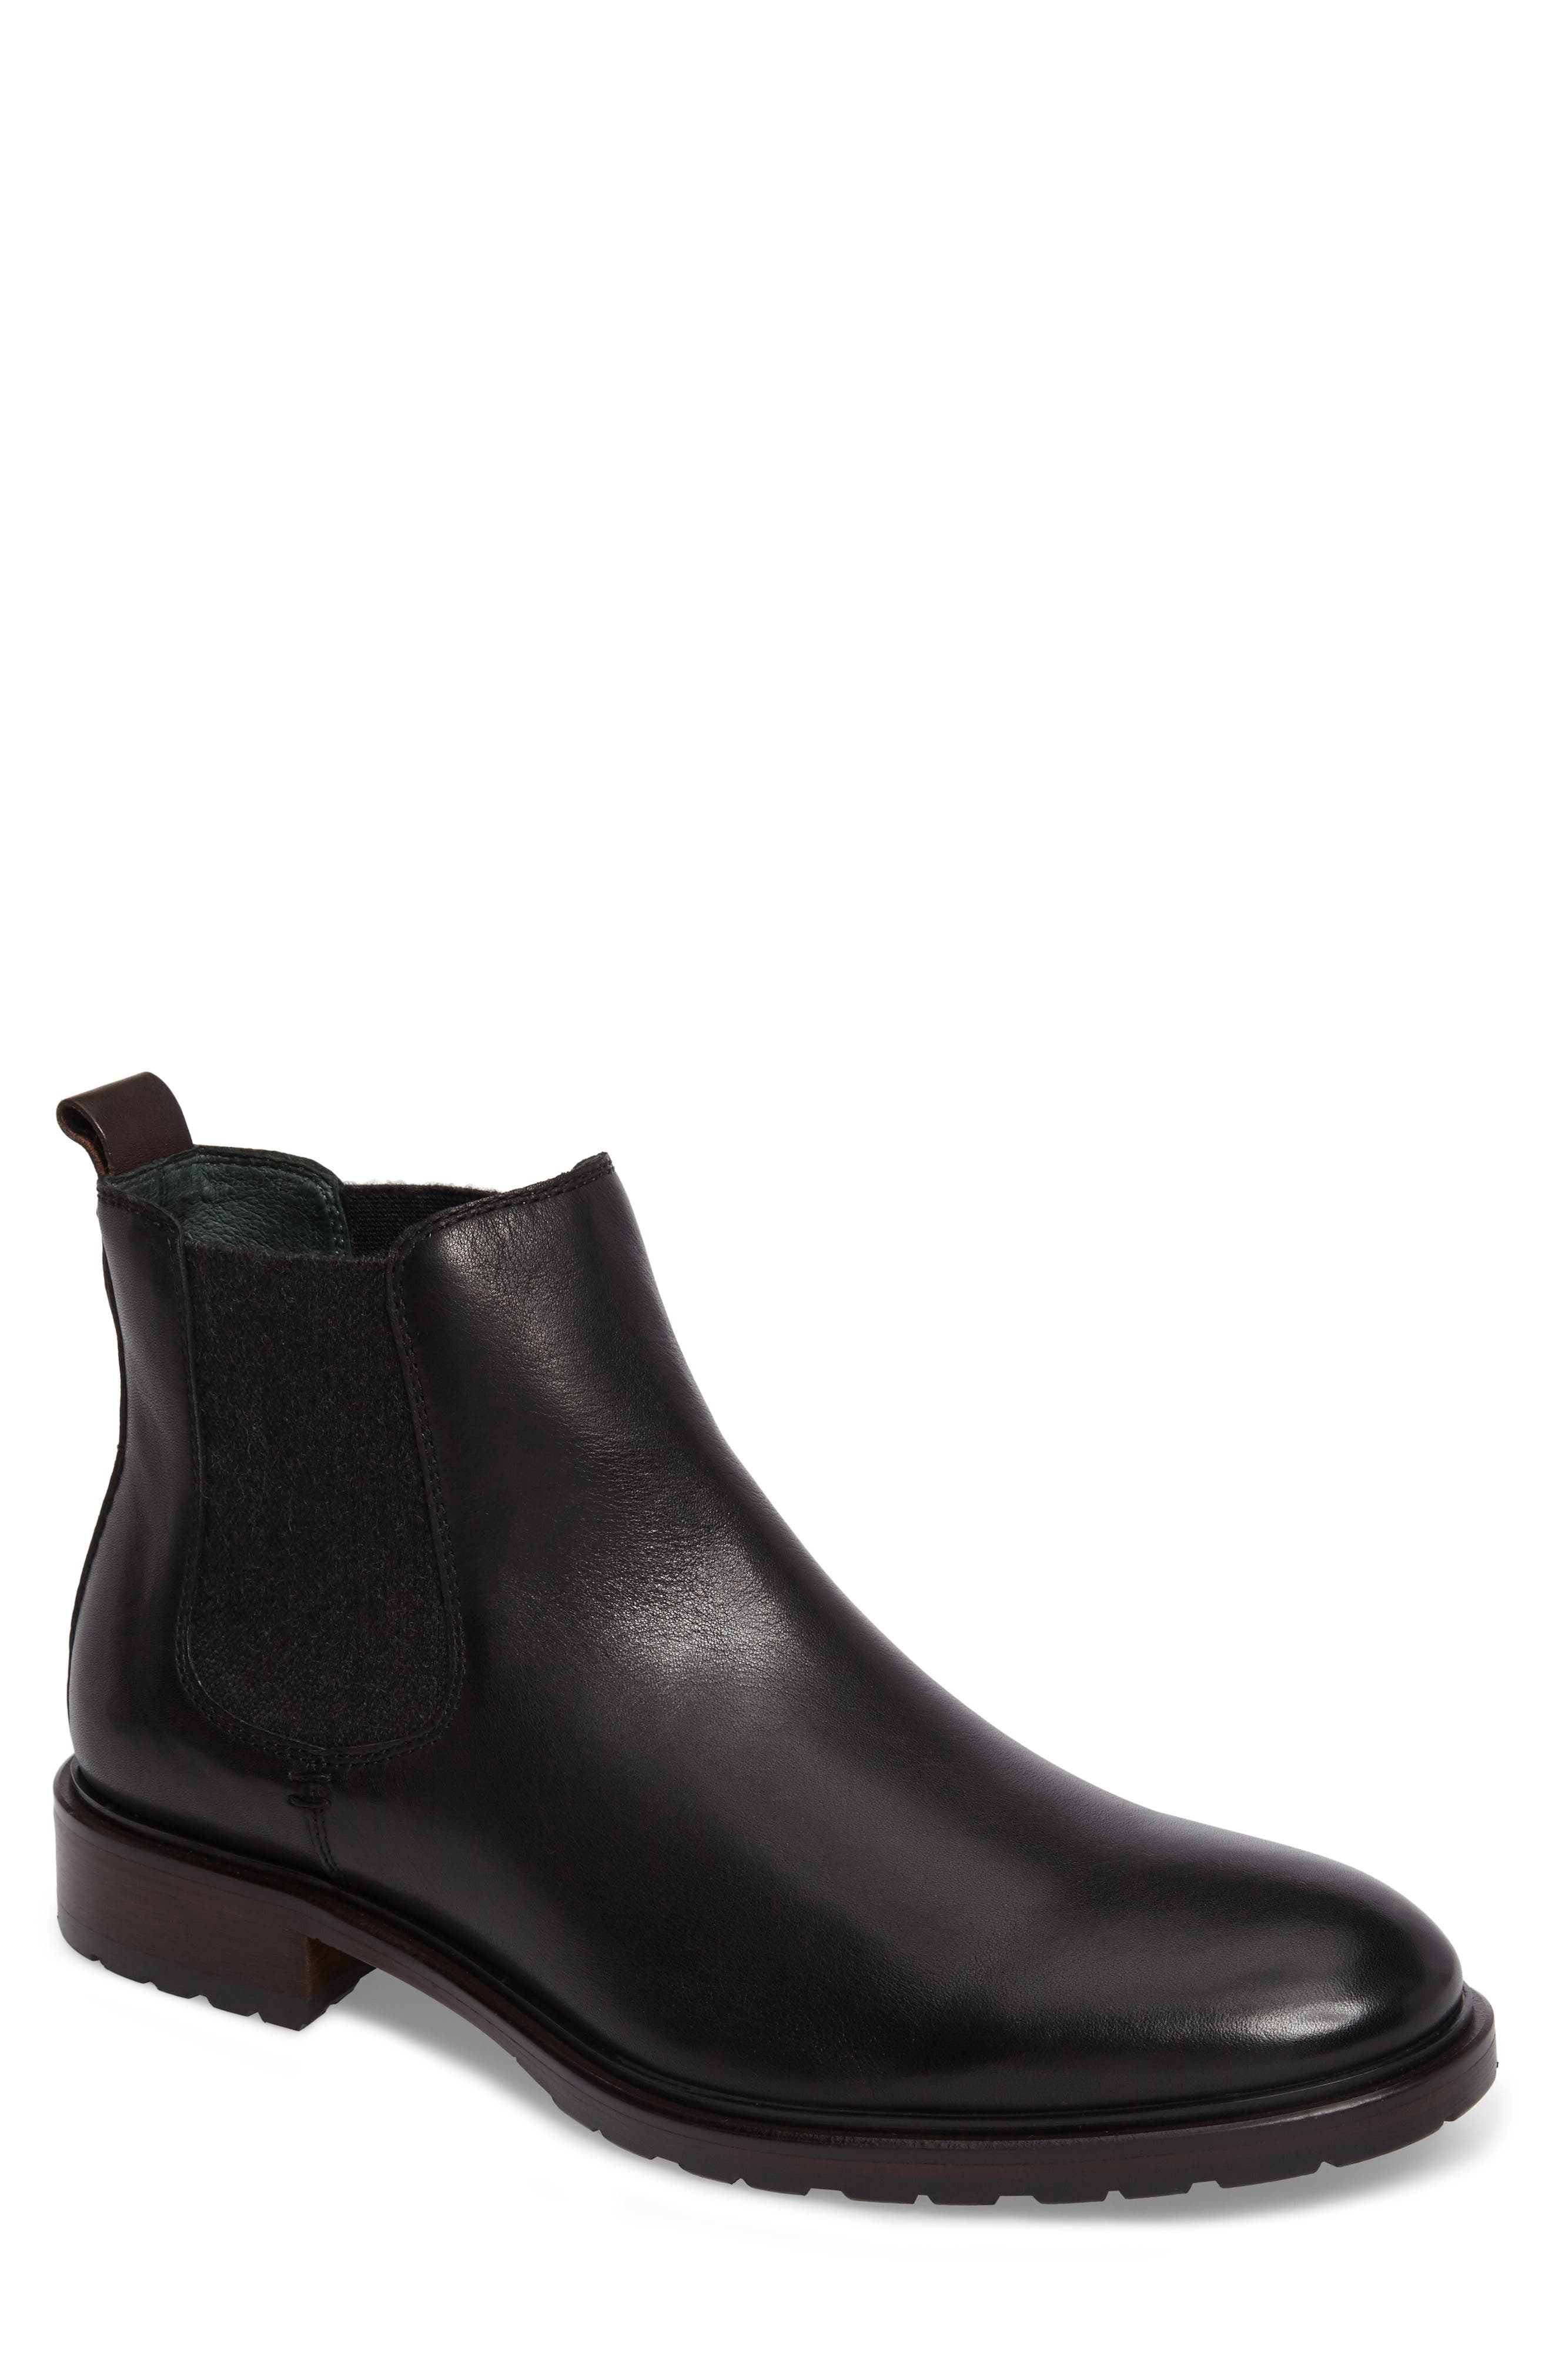 Myles Chelsea Boot,                             Main thumbnail 1, color,                             Black Leather